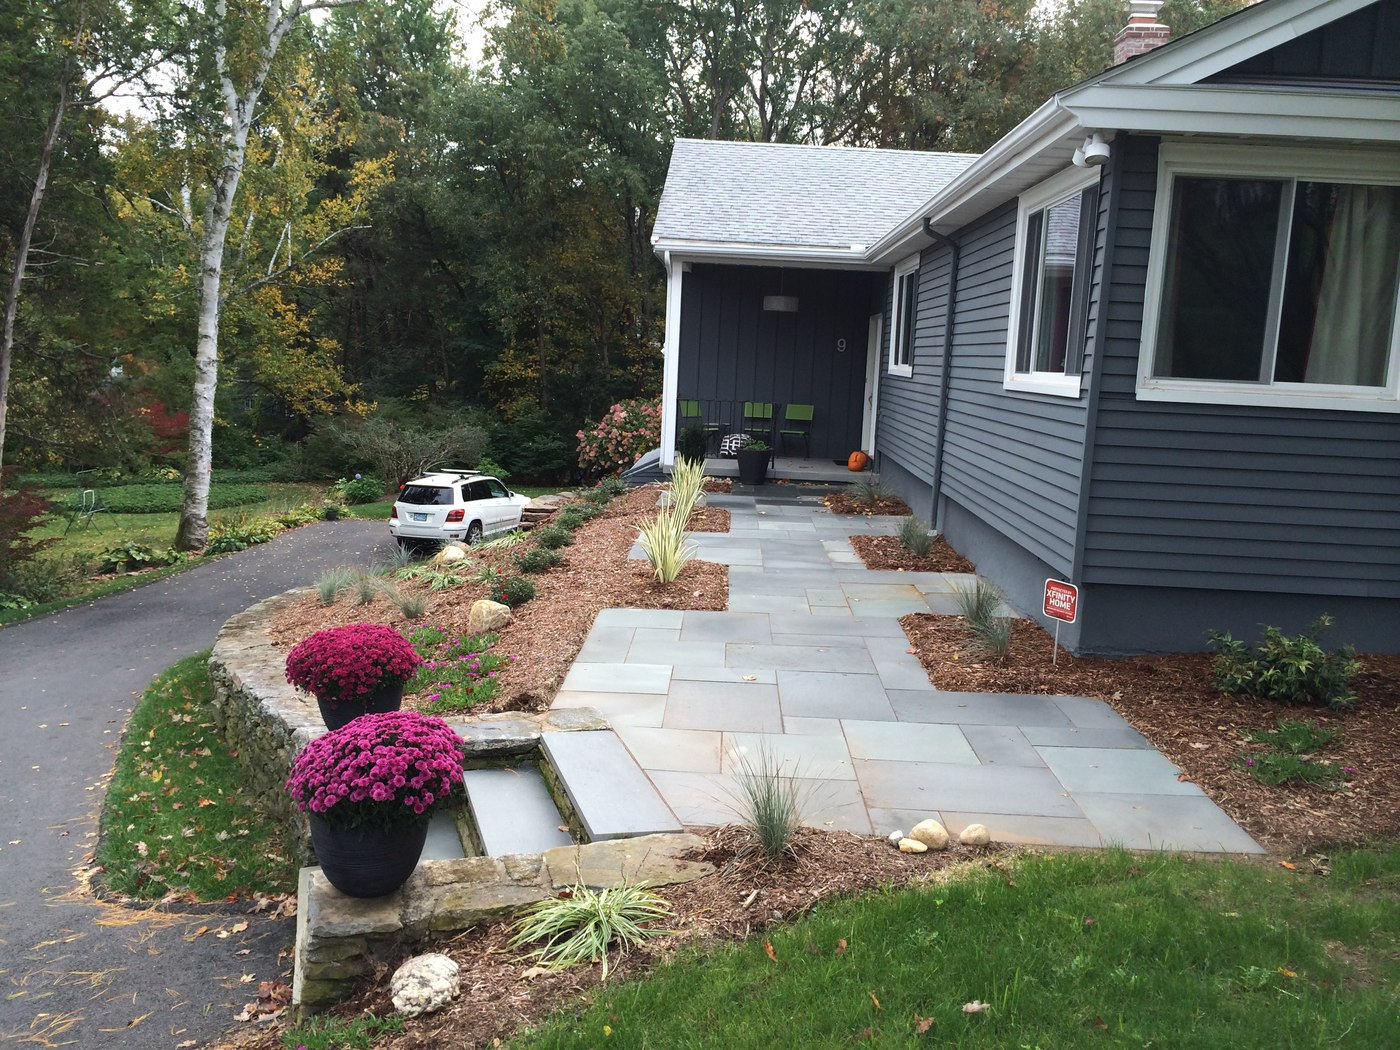 Bluestone Walkway and landscaping in West Hartford, CT